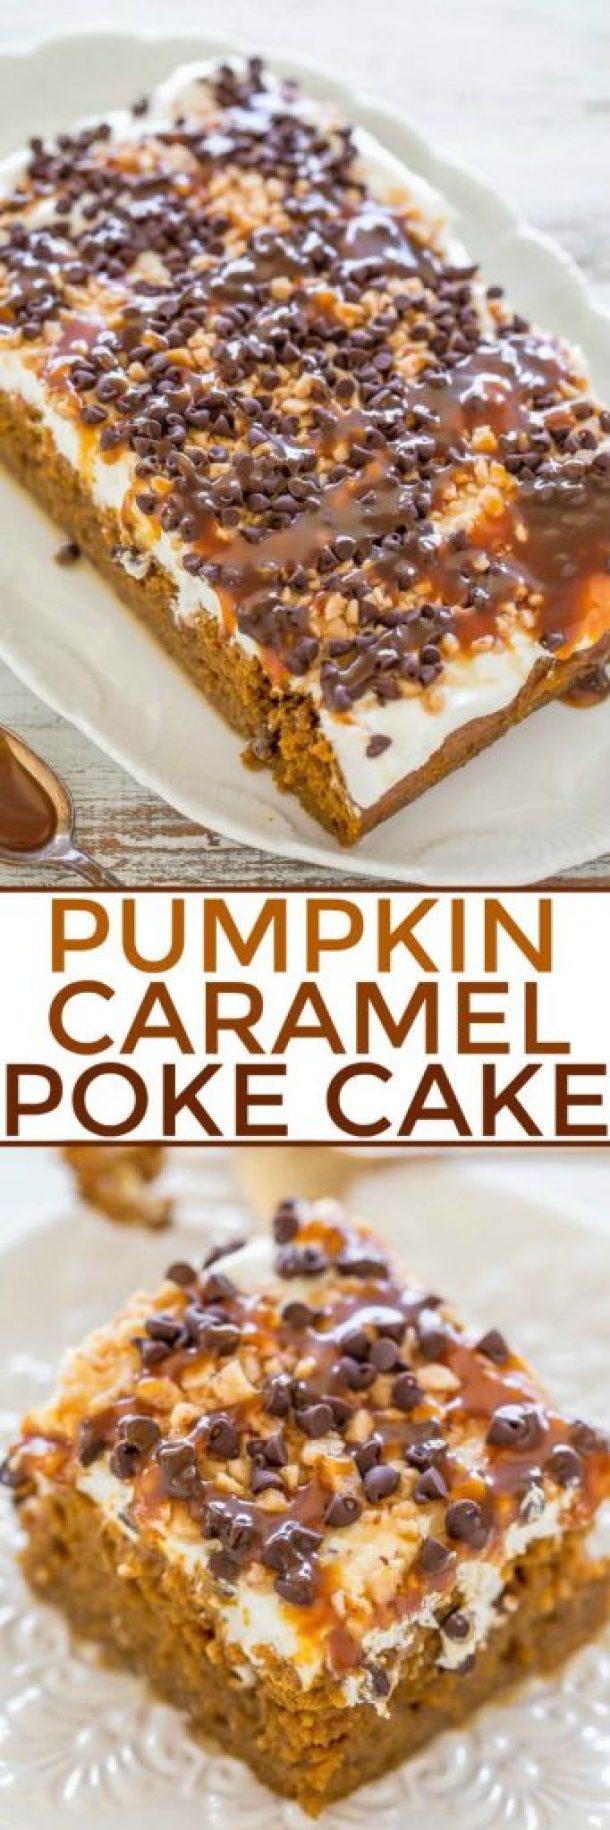 Pumpkin Caramel Poke Cake Recipe | Averie Cooks